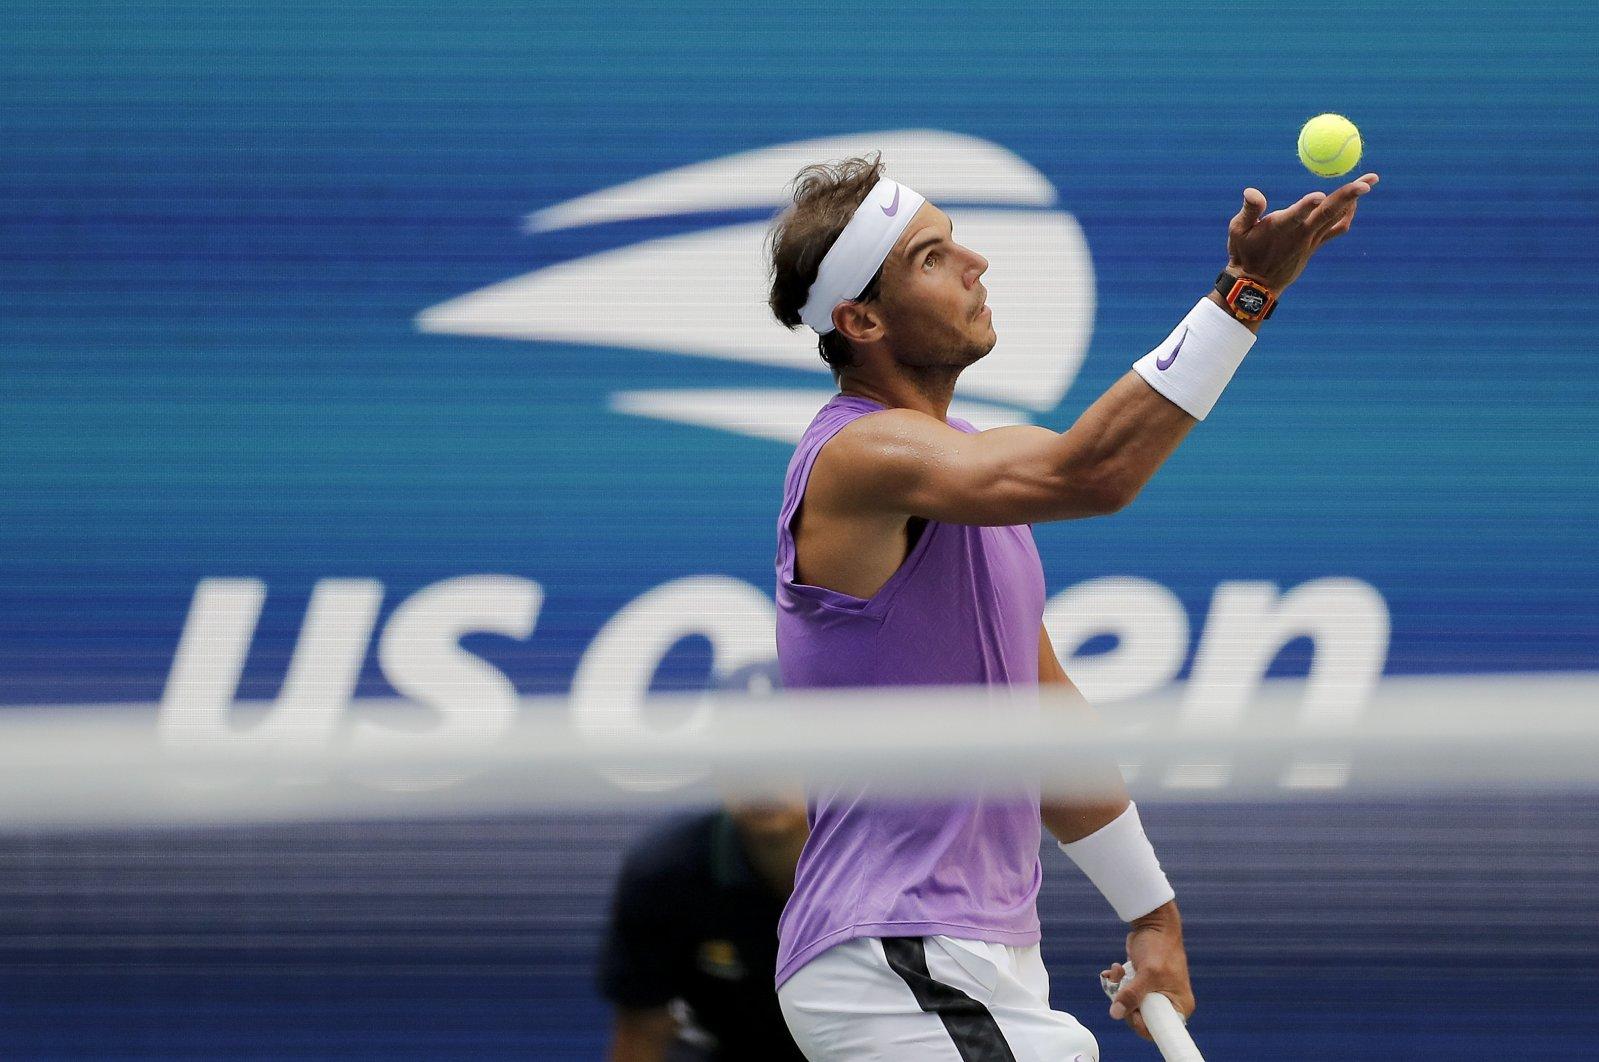 Rafael Nadal serves during a U.S. Open tennis championship match in New York, U.S., Aug. 31, 2019. (AP Photo)